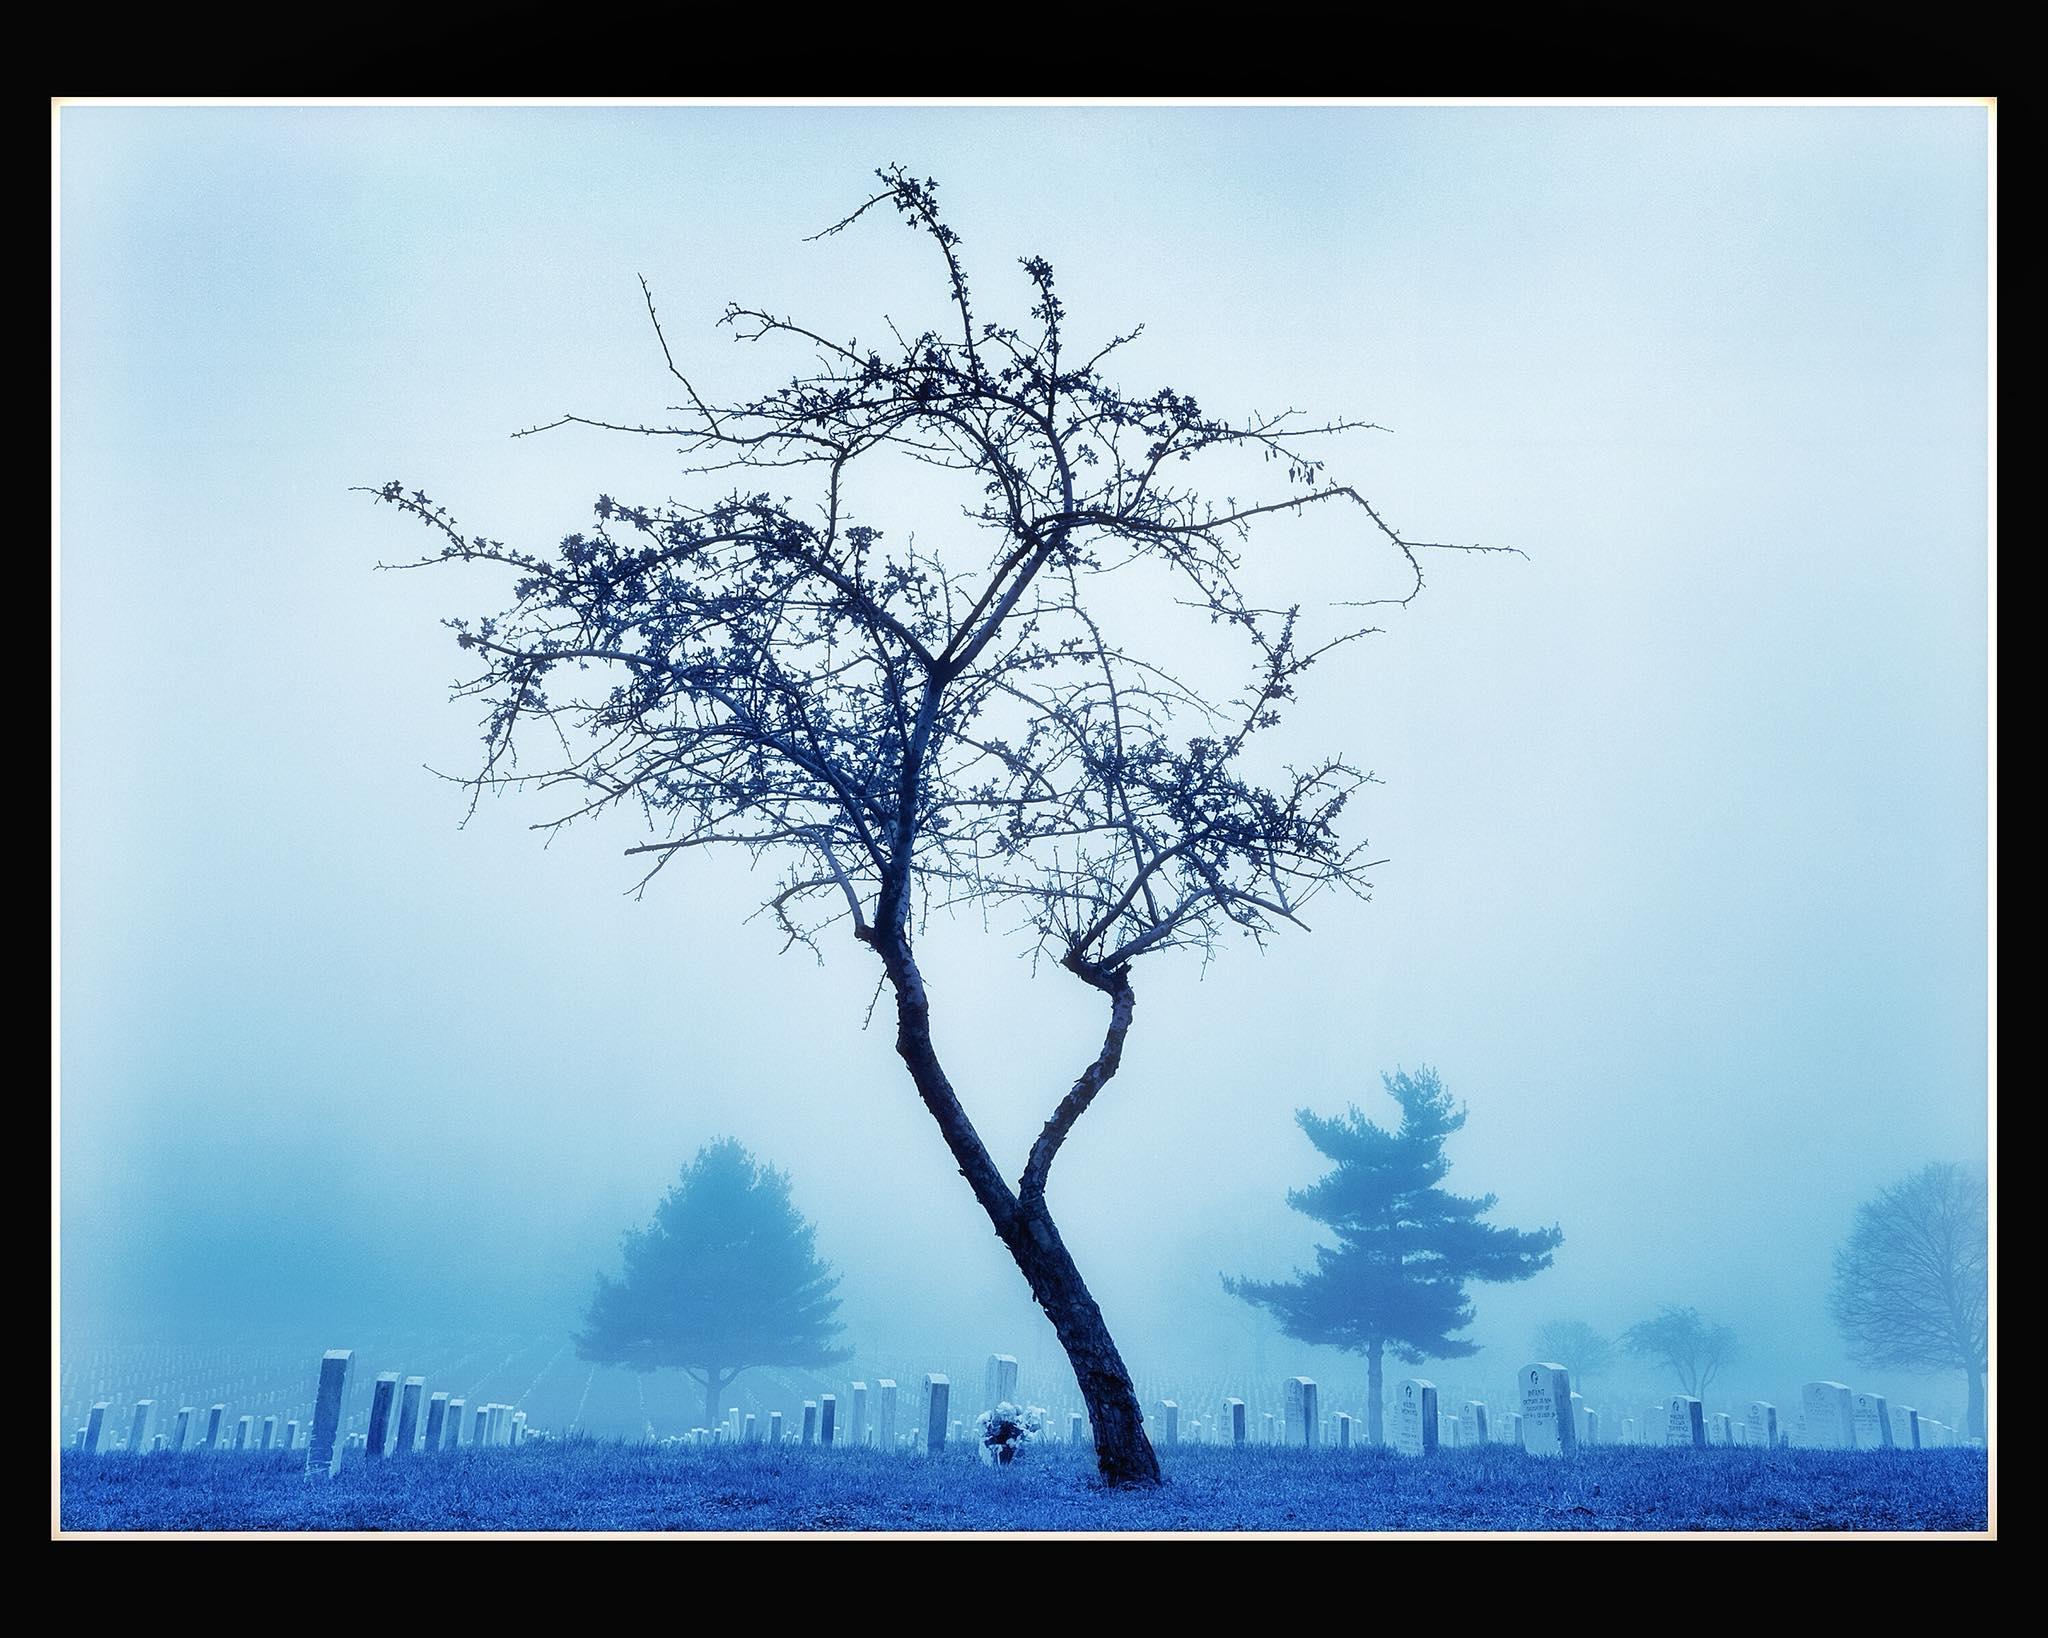 Winter Melancholy Creeps In This Petty >> Joseph Hyde S Portfolio Baker Artist Portfolio